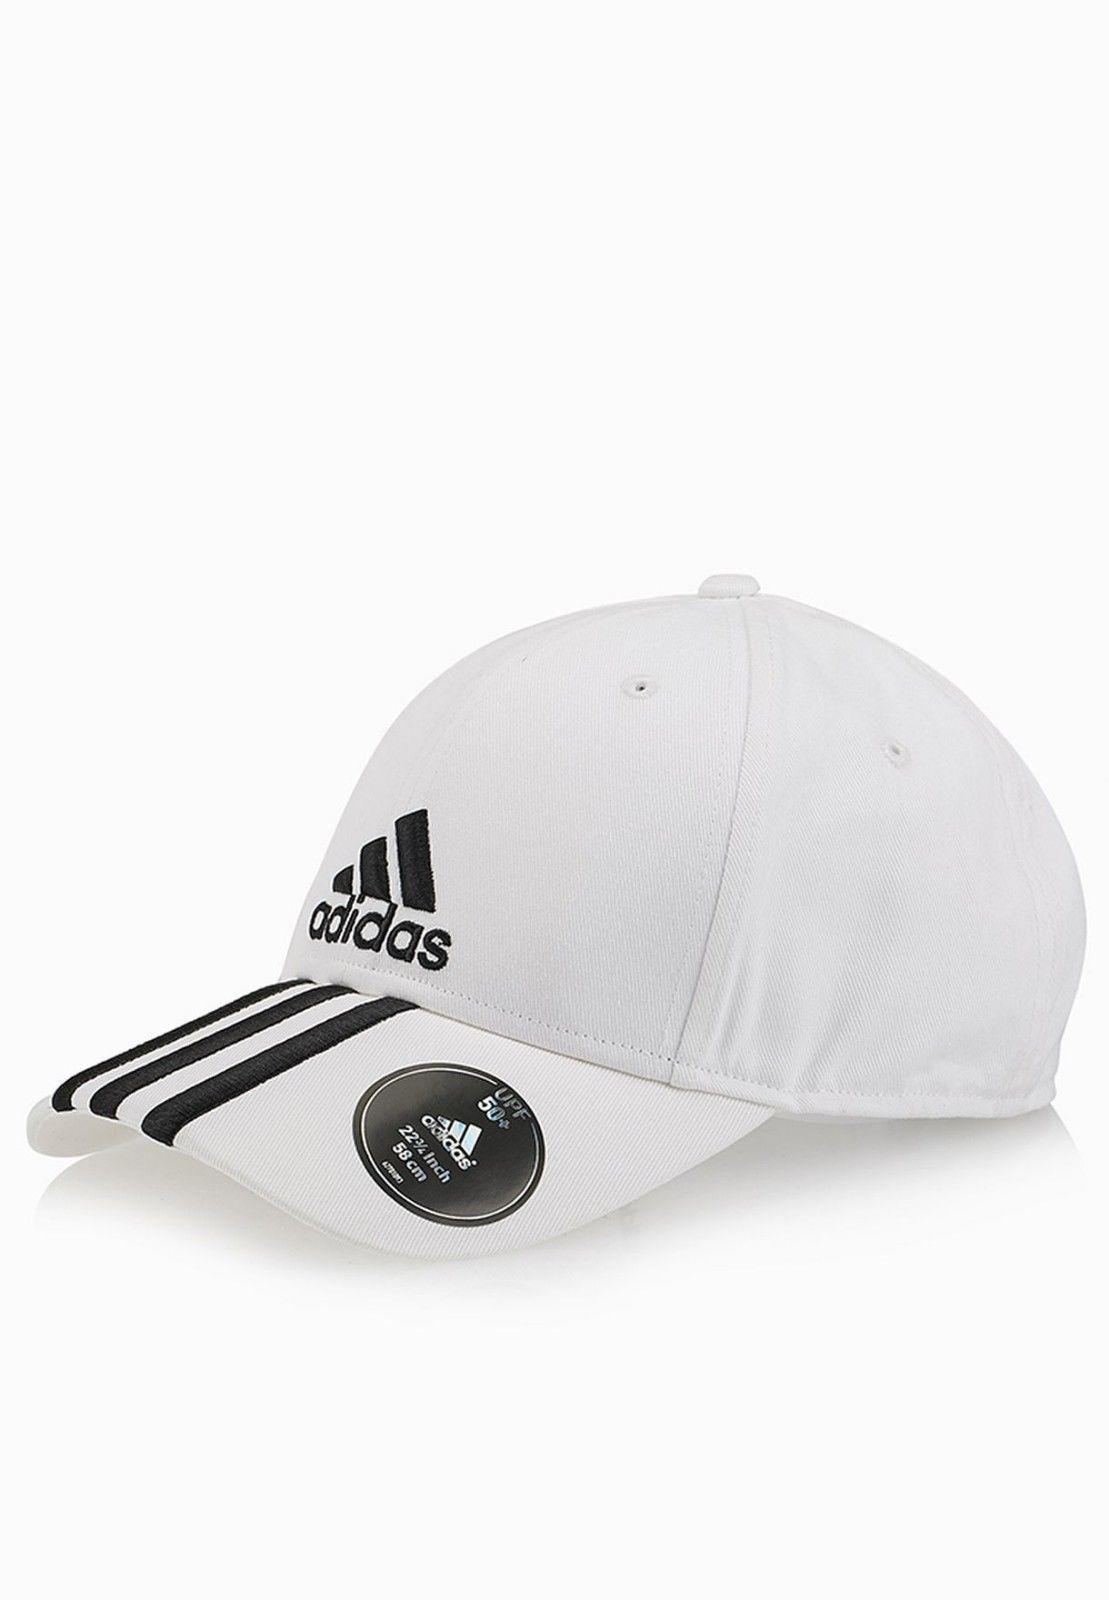 New Adidas Performance 3-Stripes Cap White hat -  39.24 97fcebf7db4b